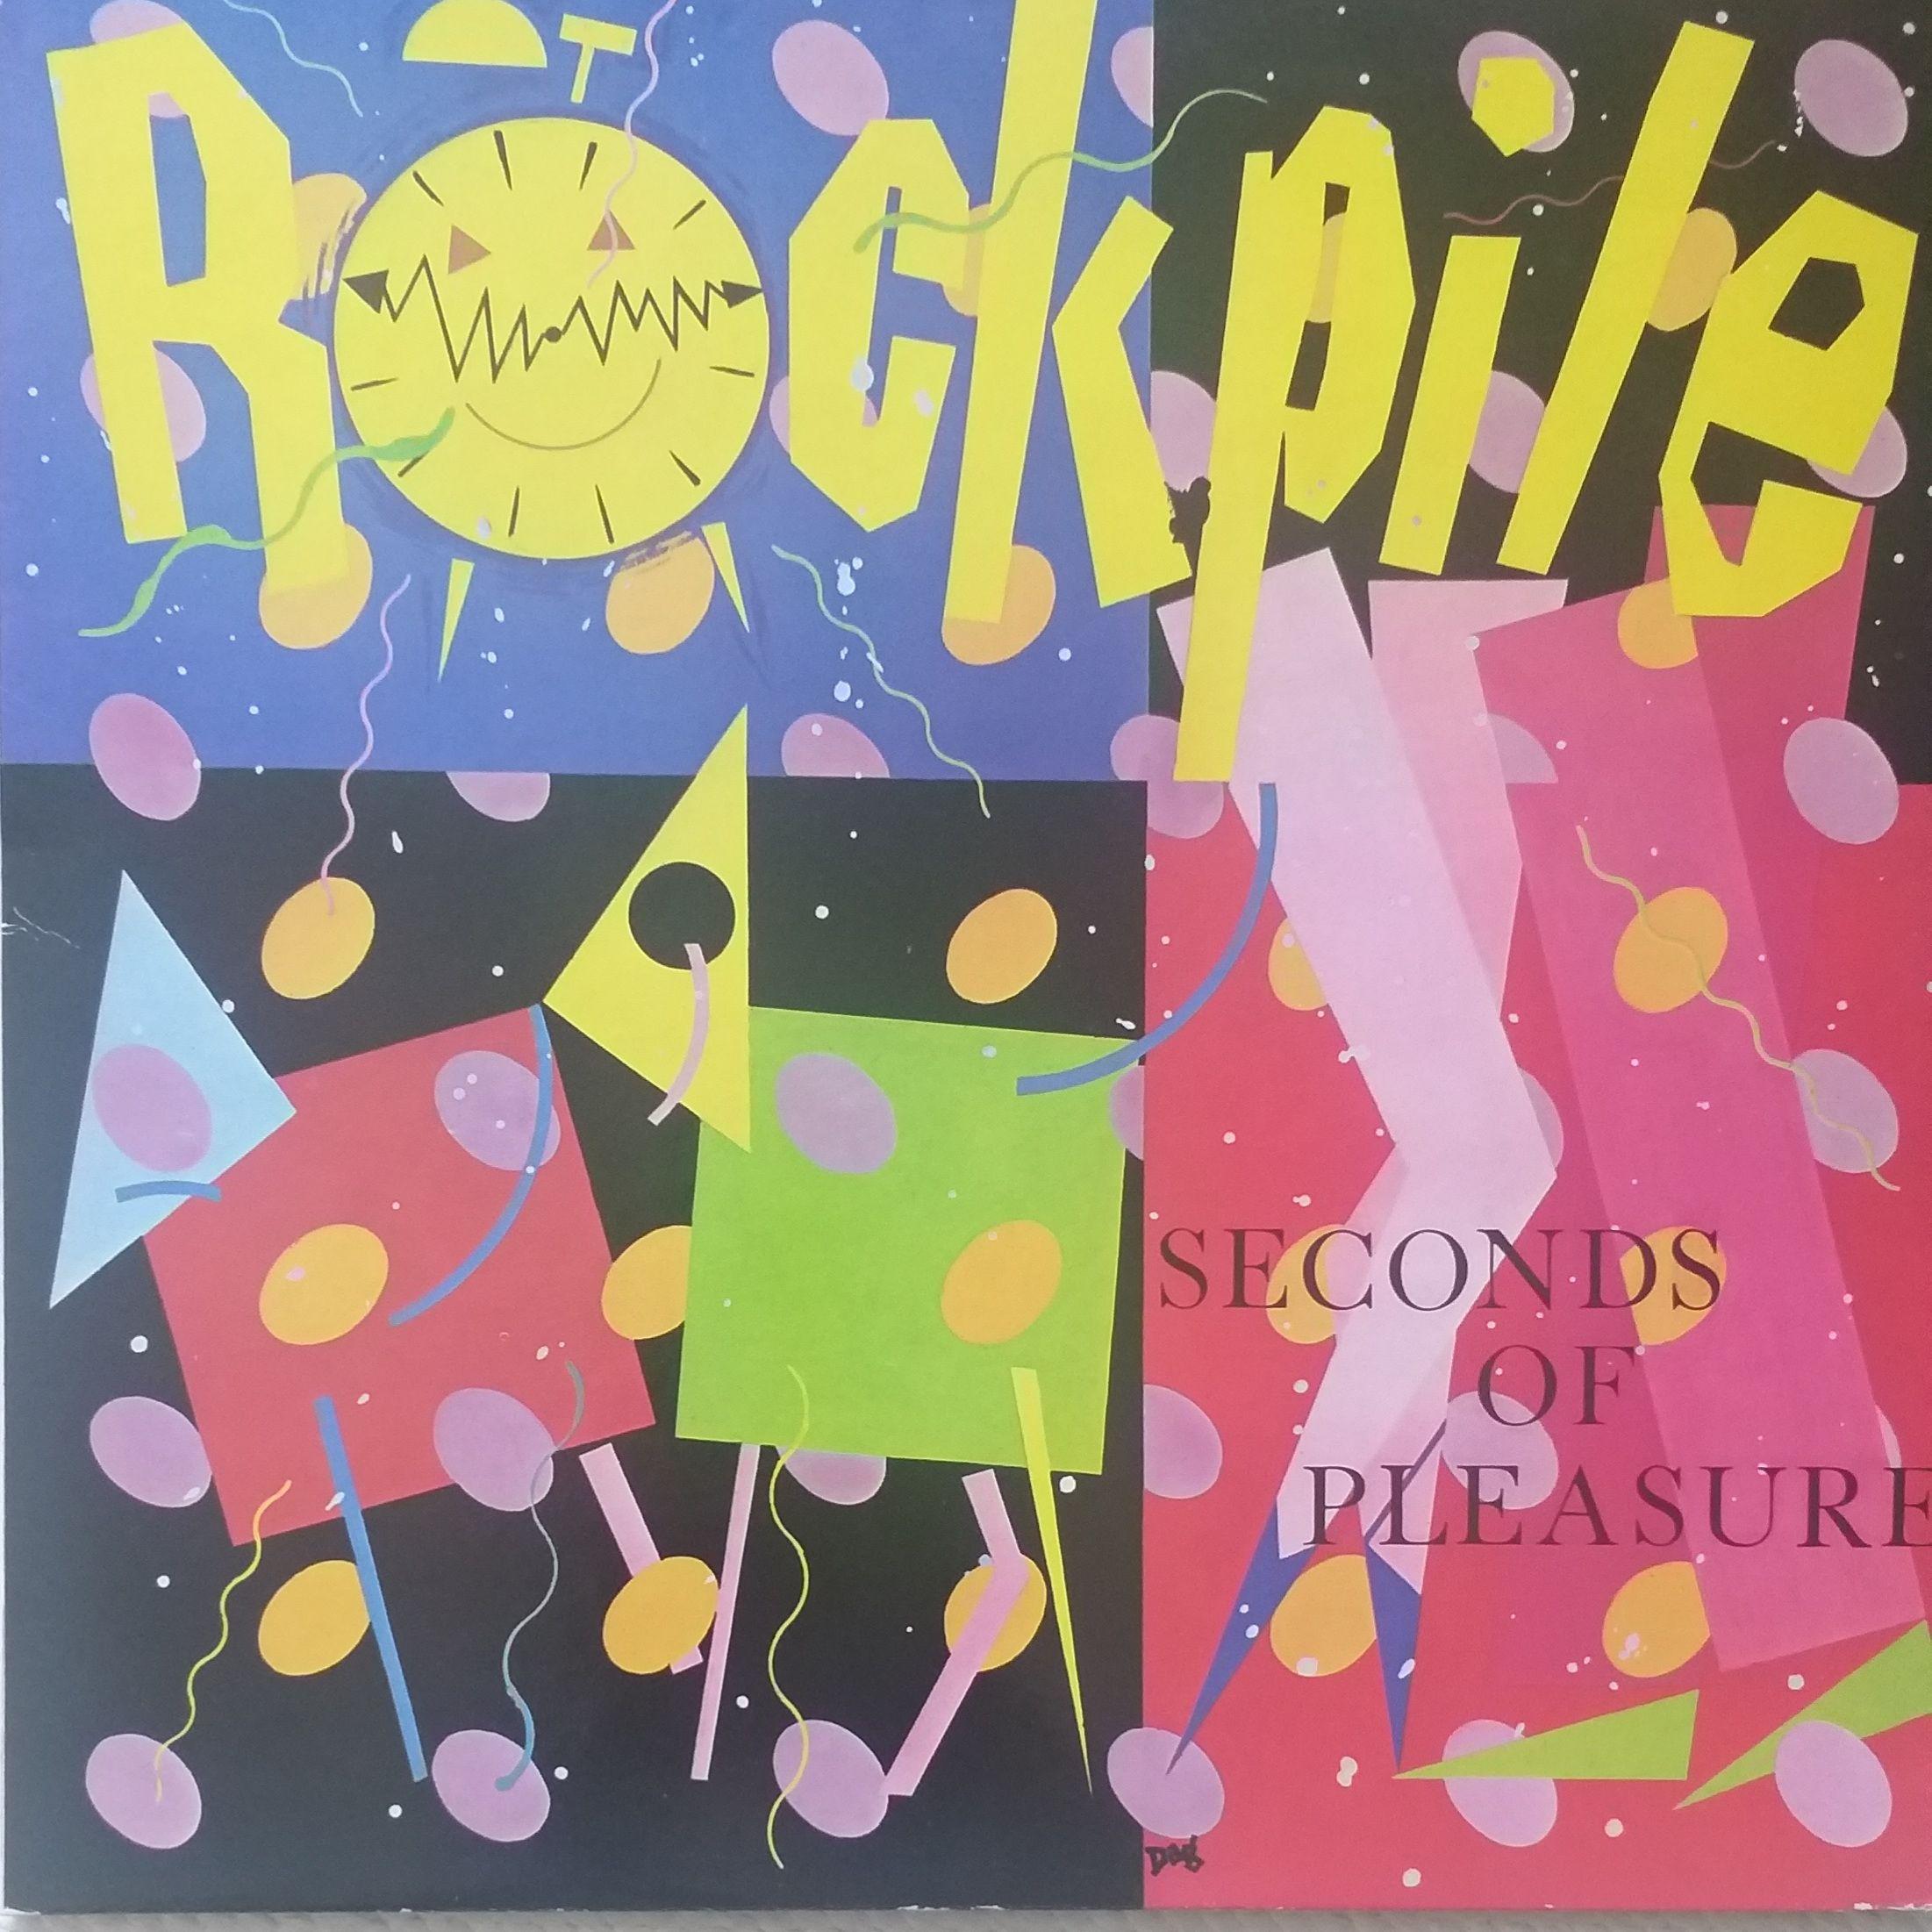 Rockpile Seconds of pleasure LP undefined